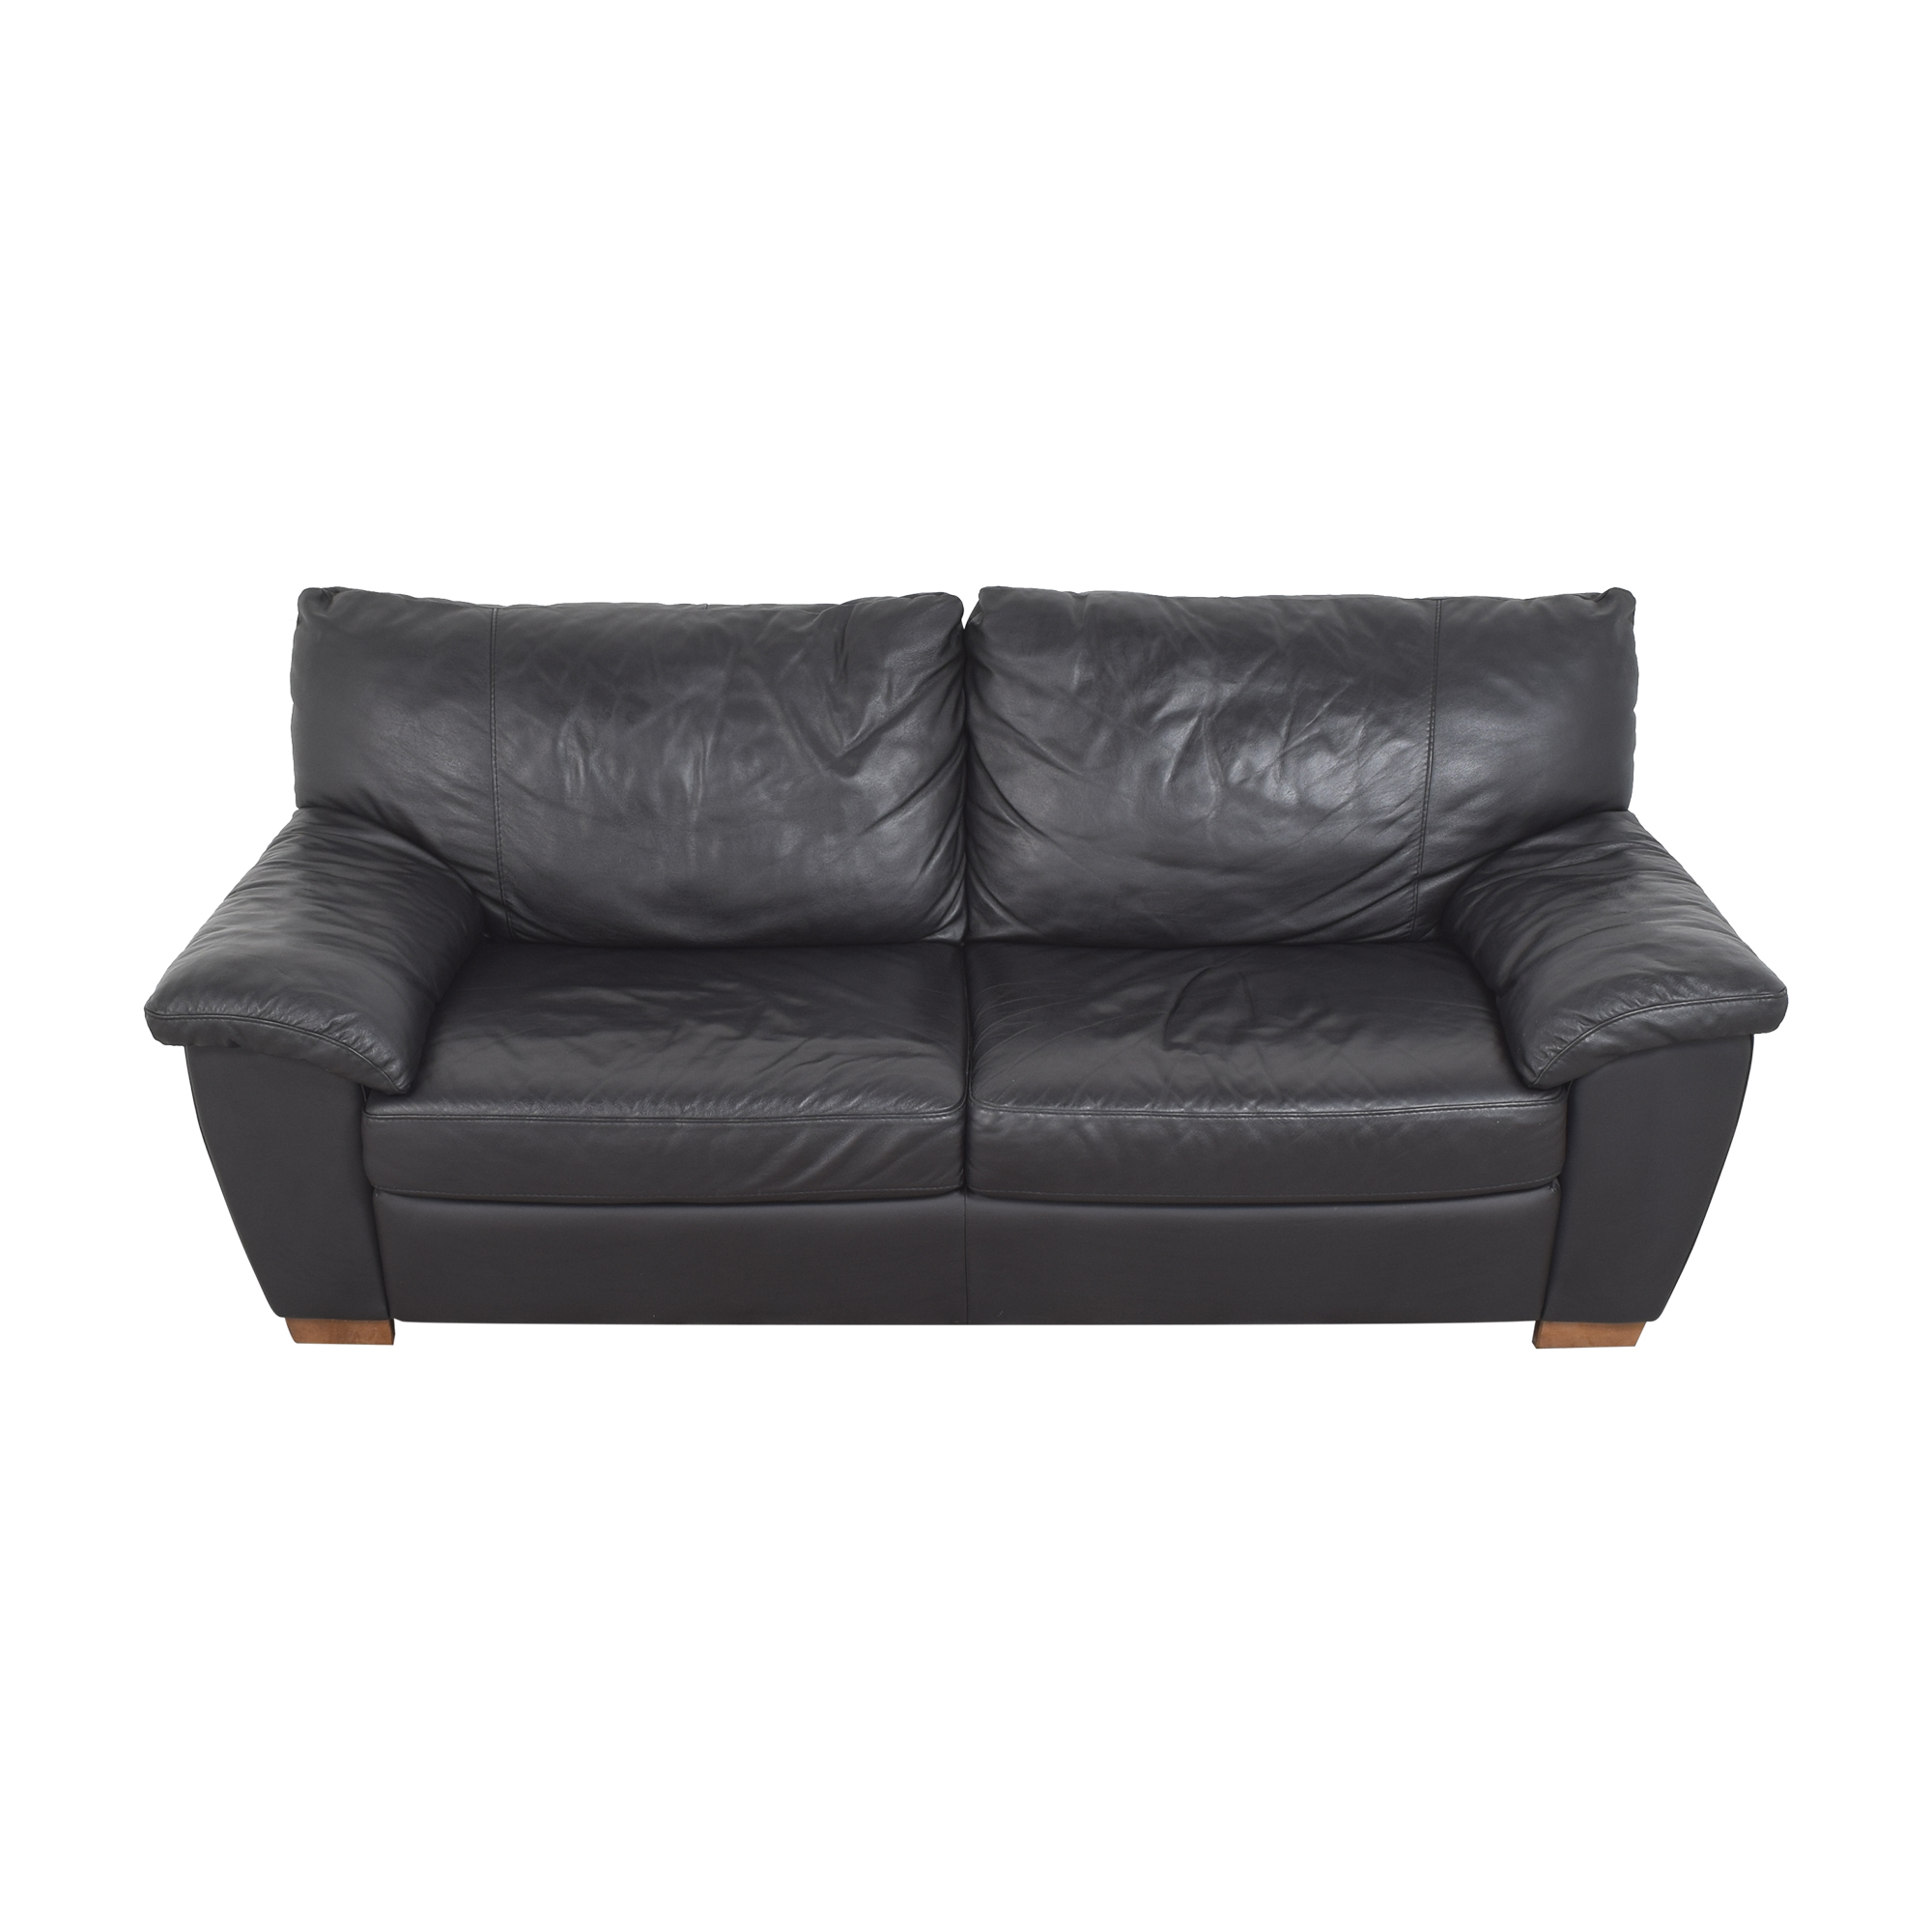 IKEA IKEA VRETA Sofa ct